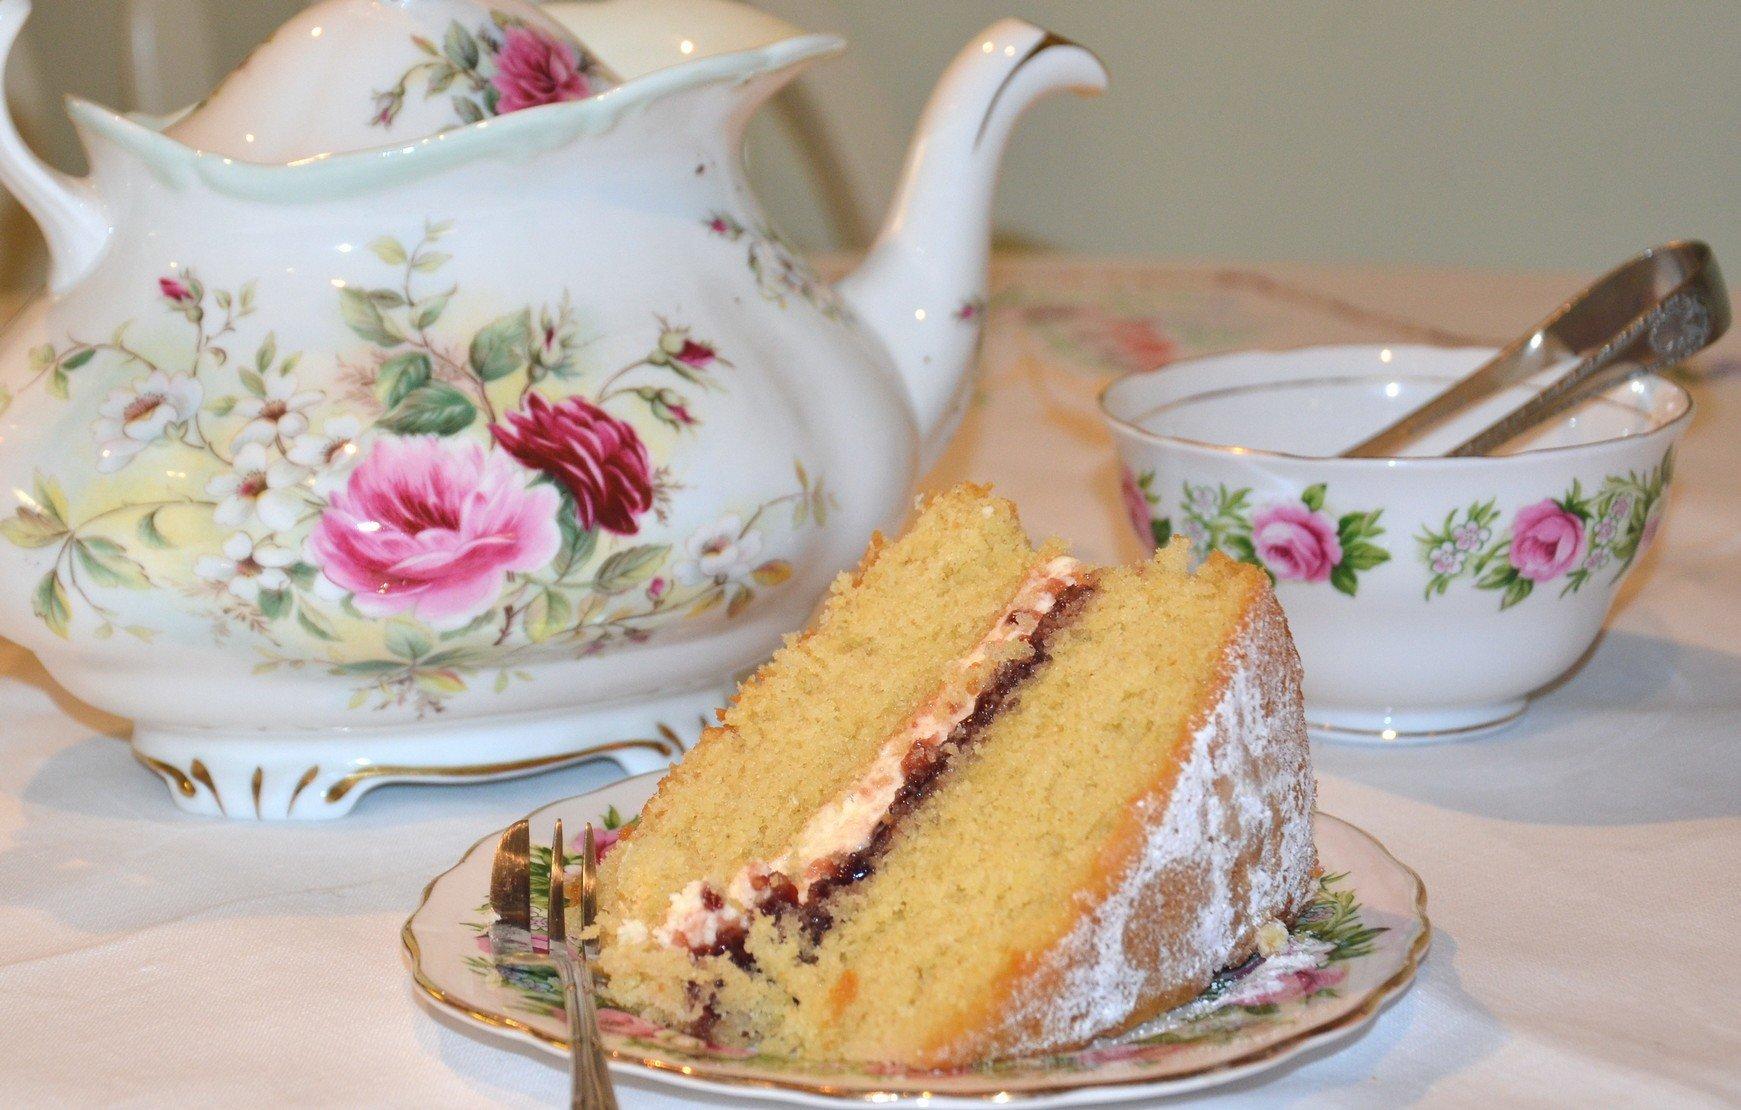 cream and jam slice with tea